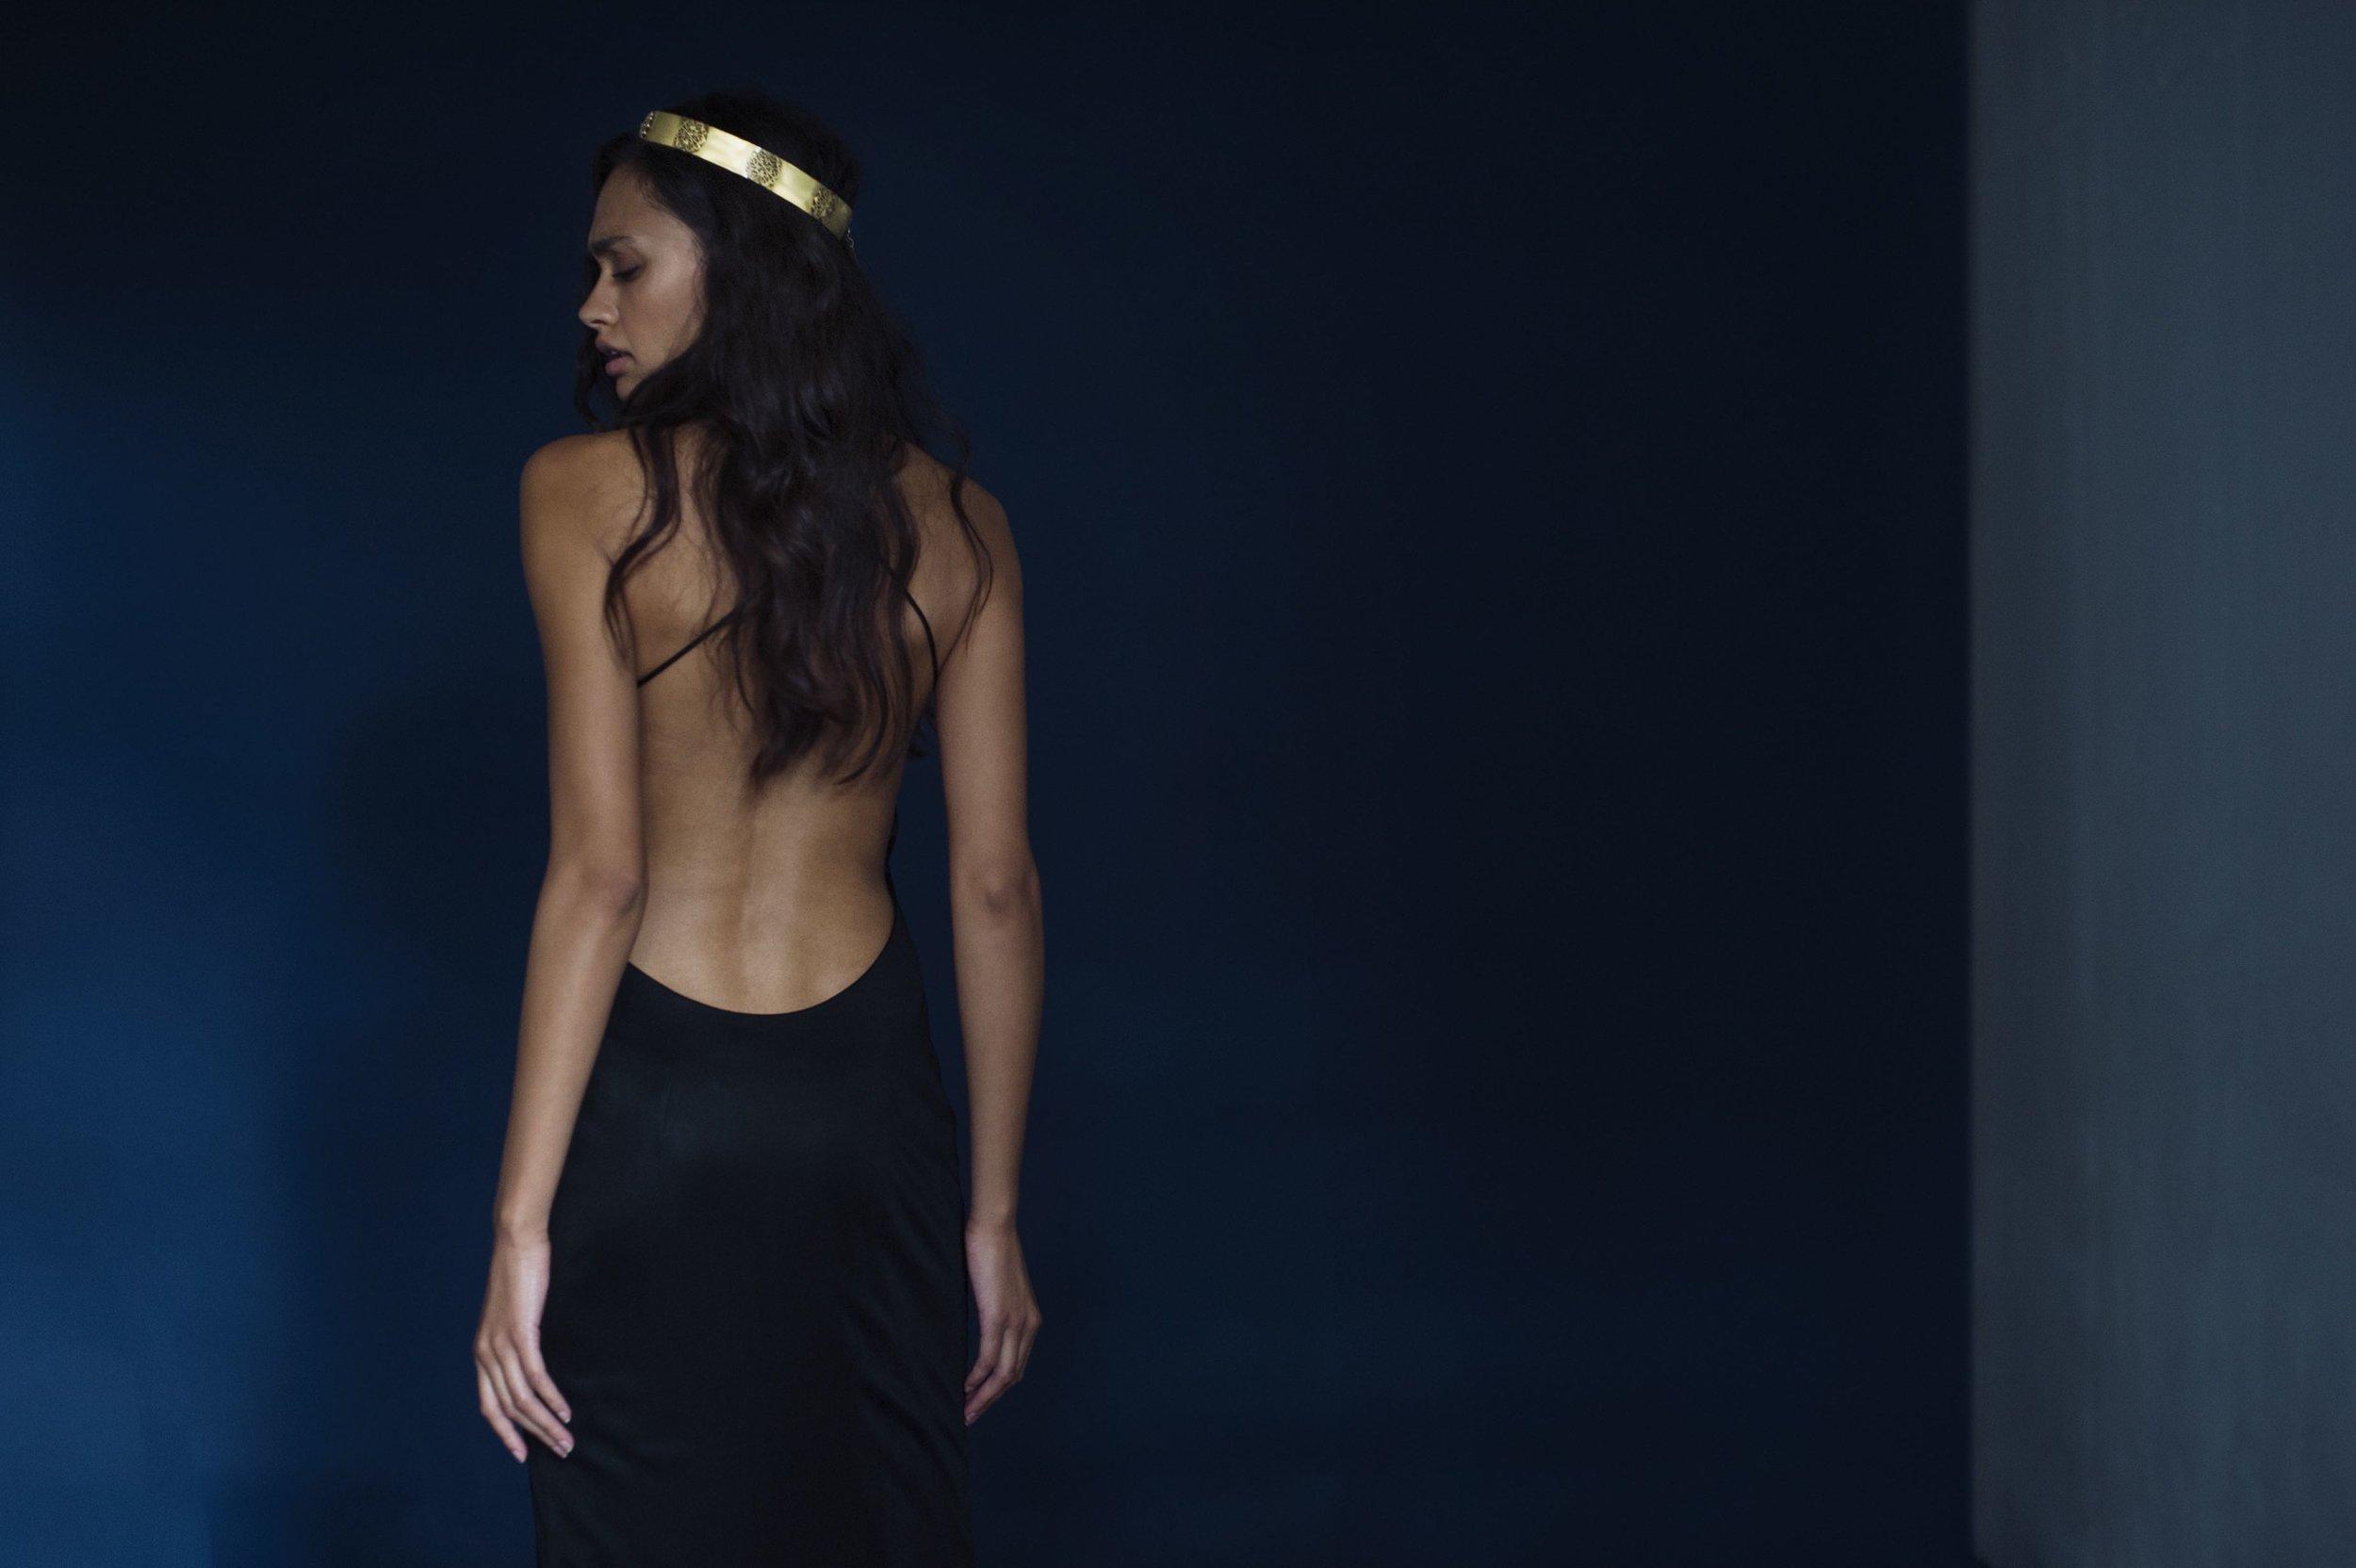 Nicole - The Goddess